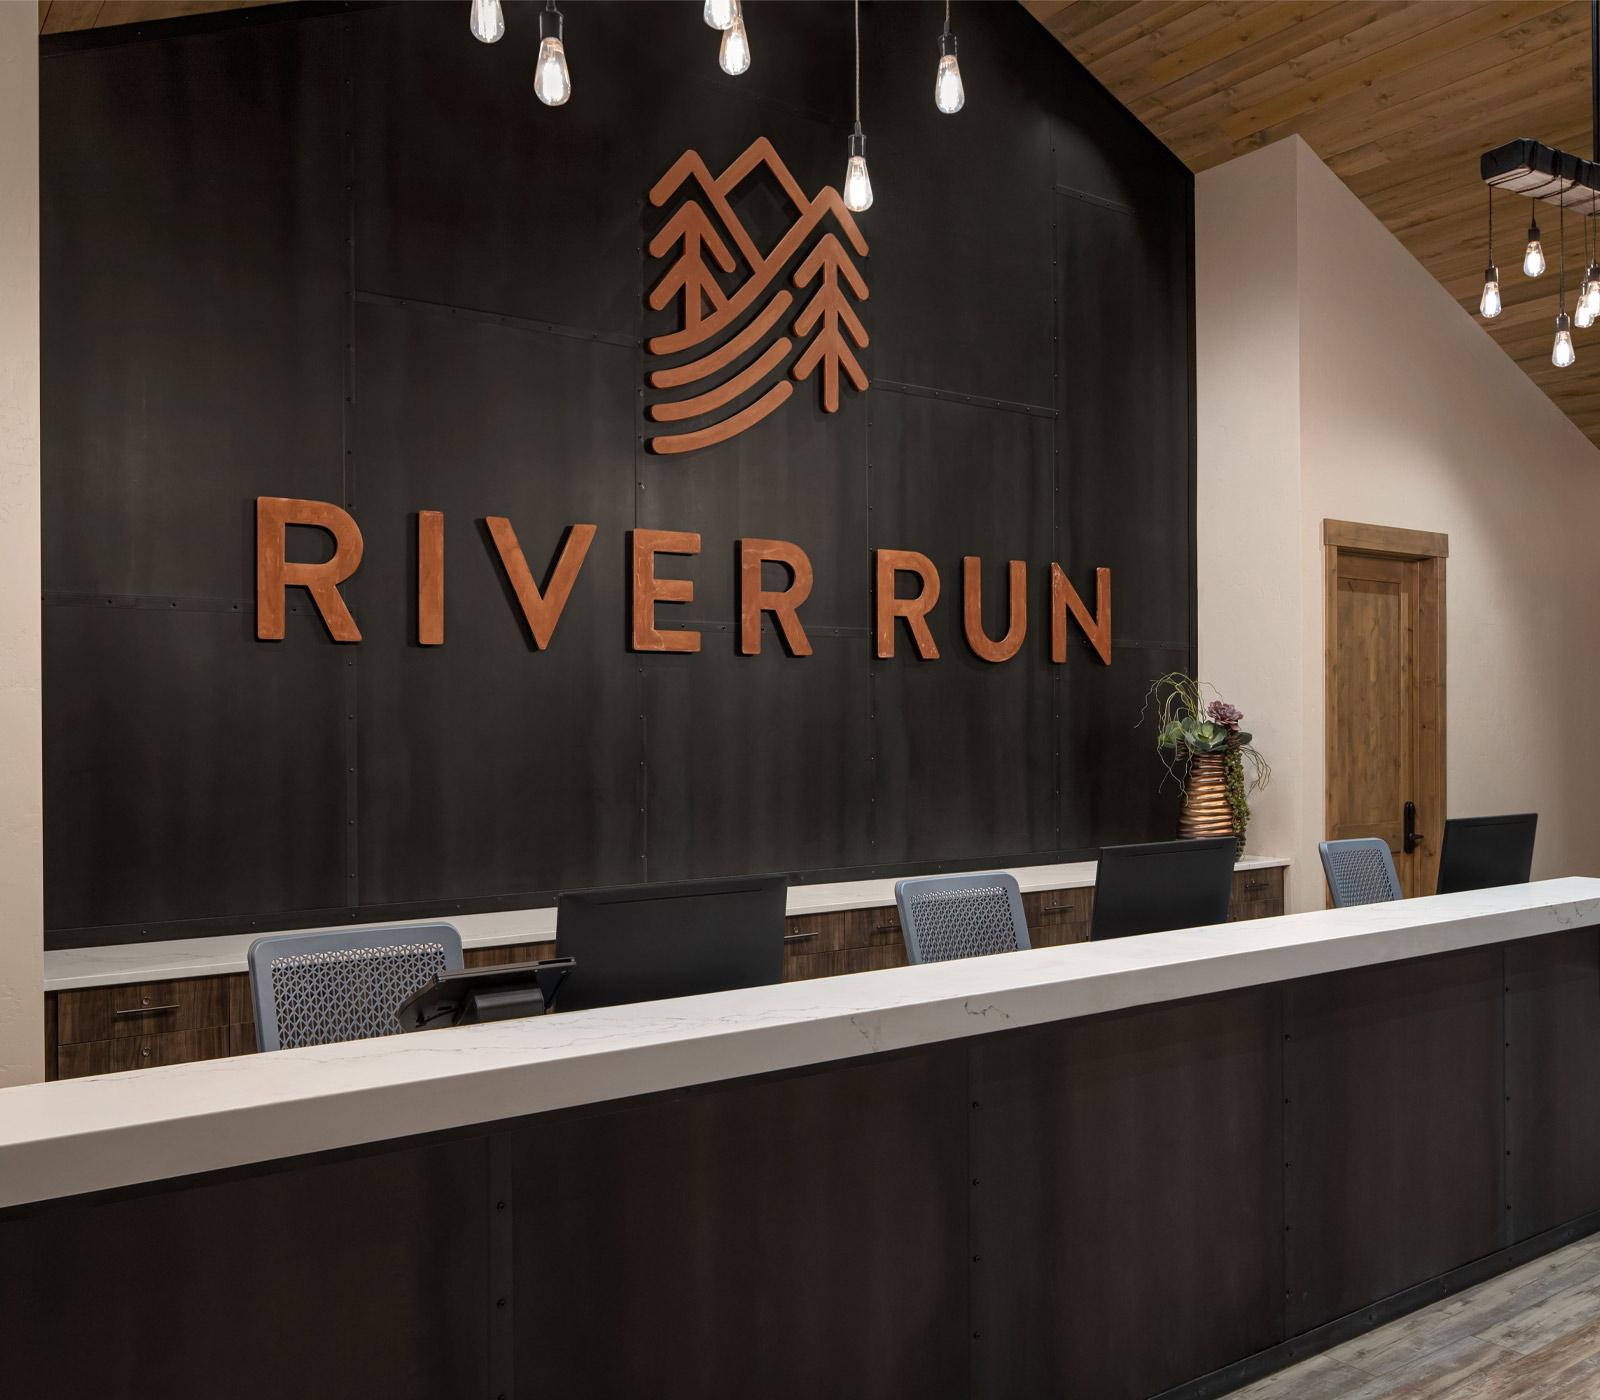 River Run Welcome Center